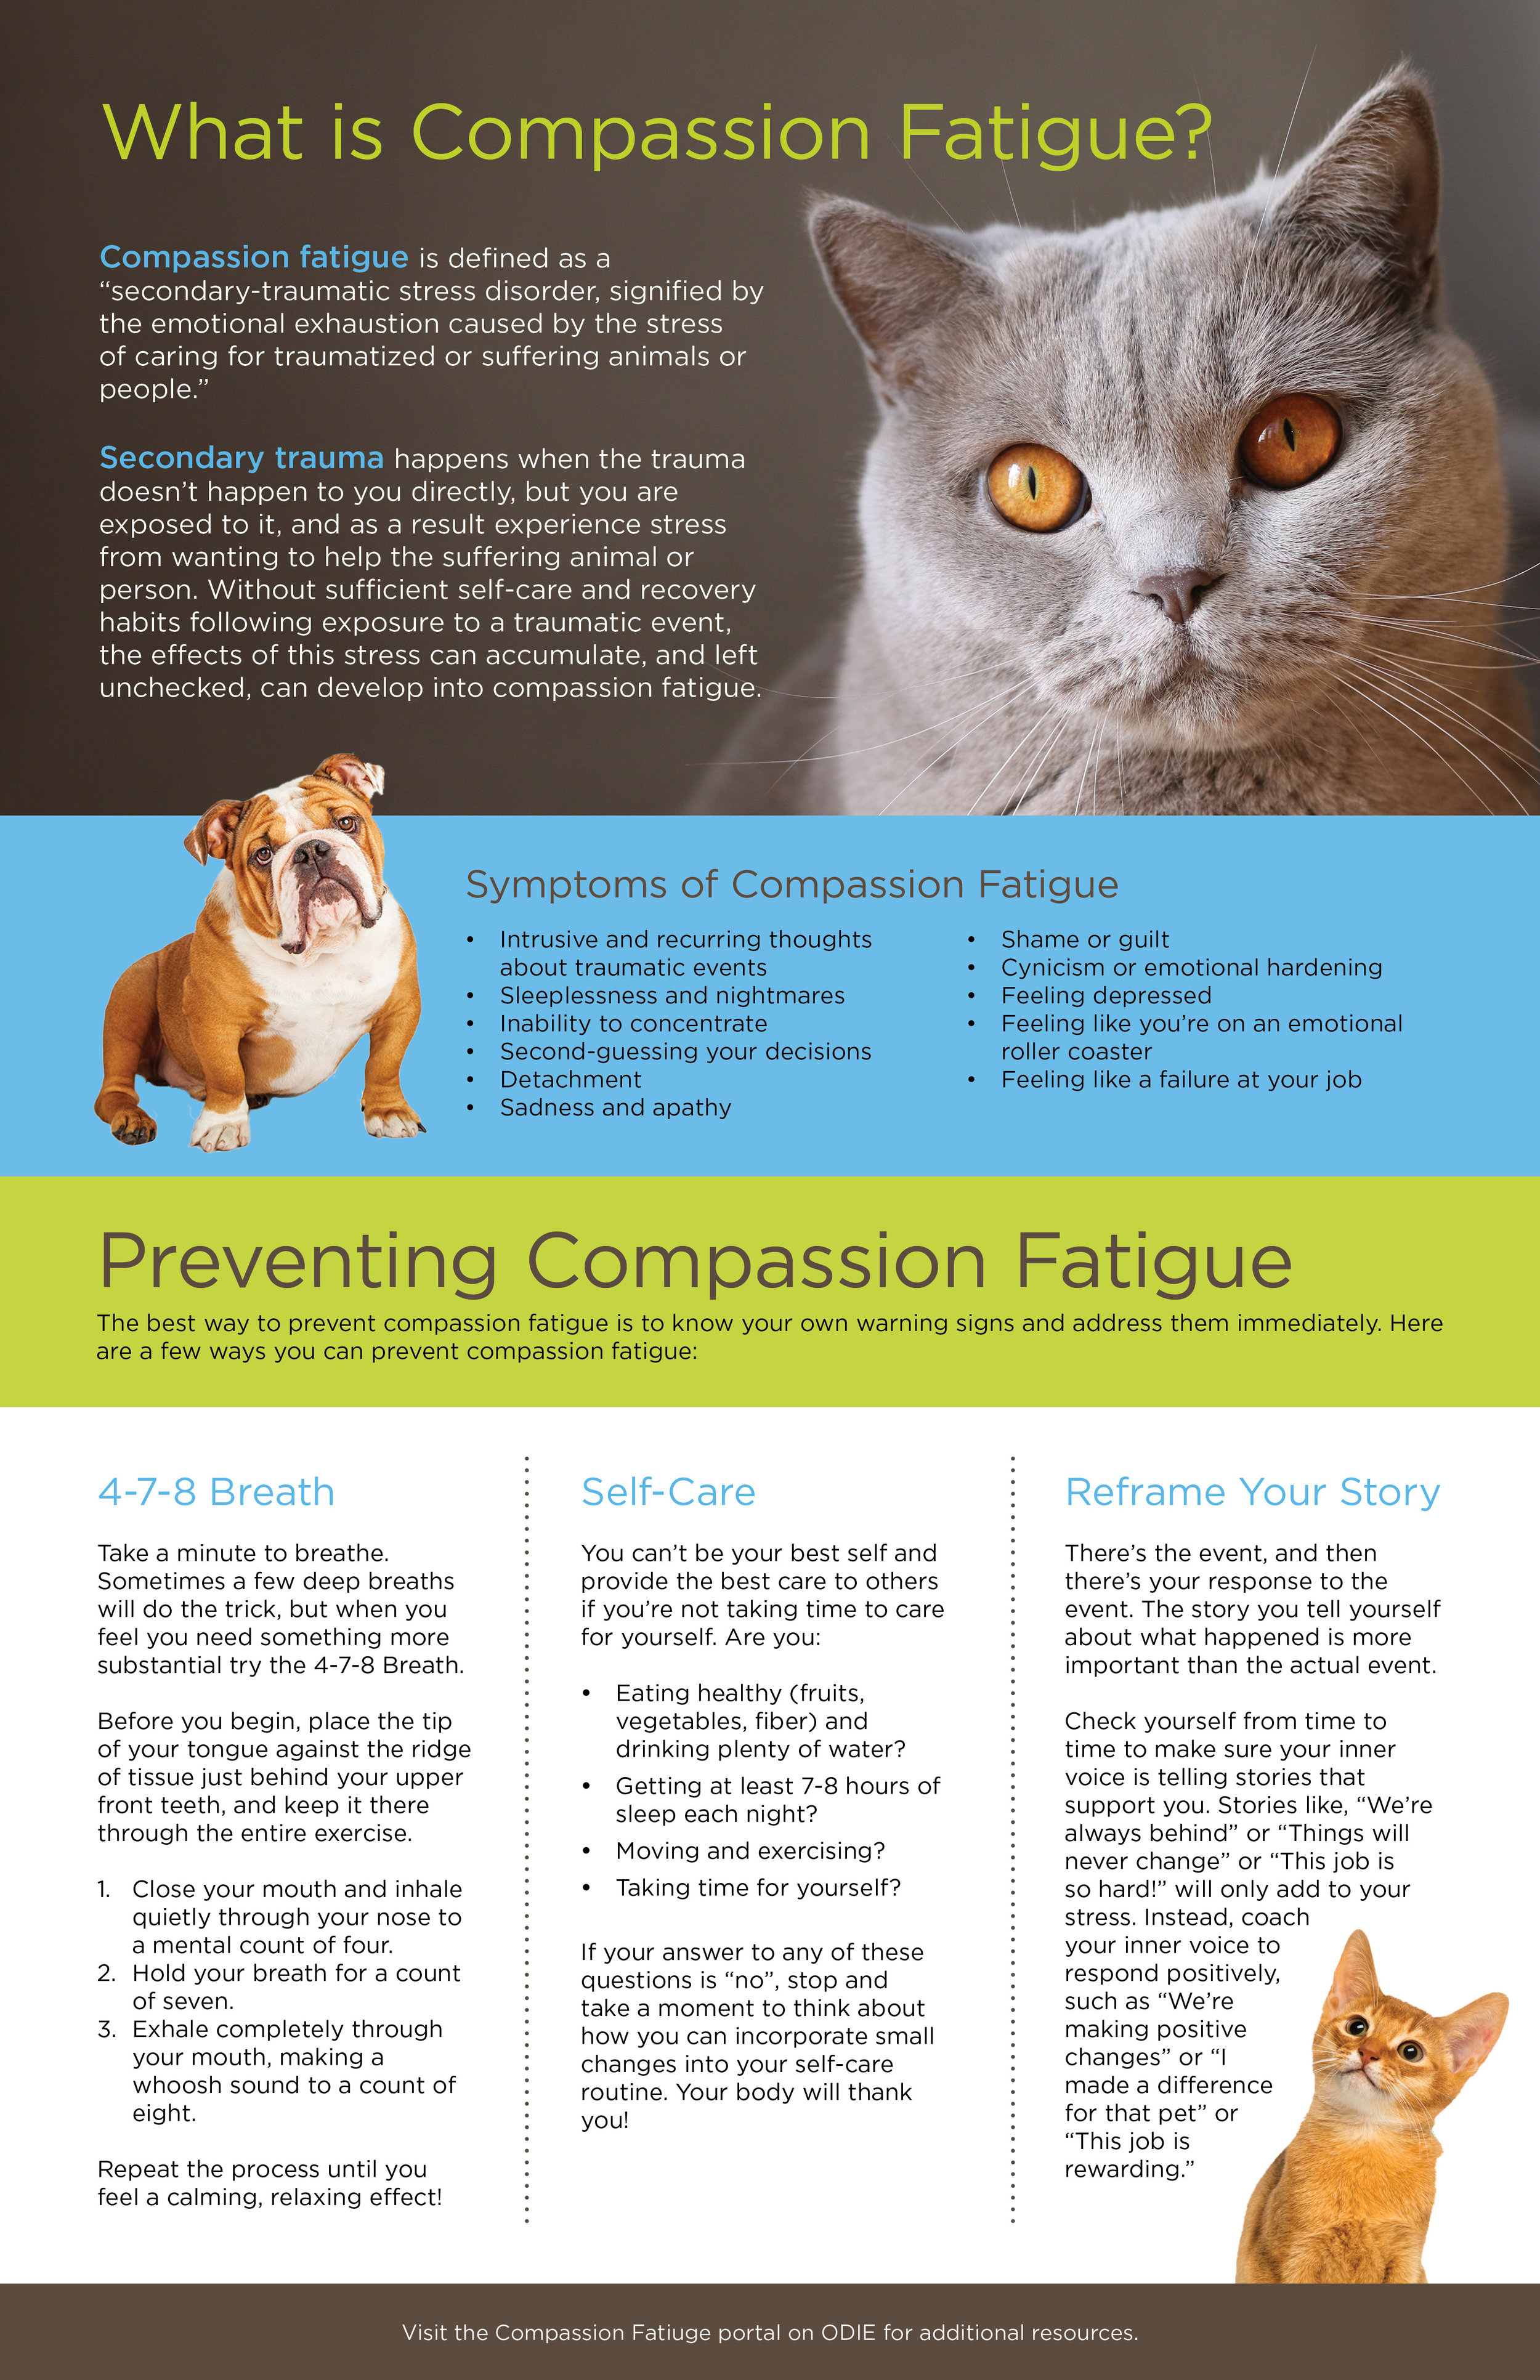 AHS Compassion Fatiuge JA1 v2.0.jpg